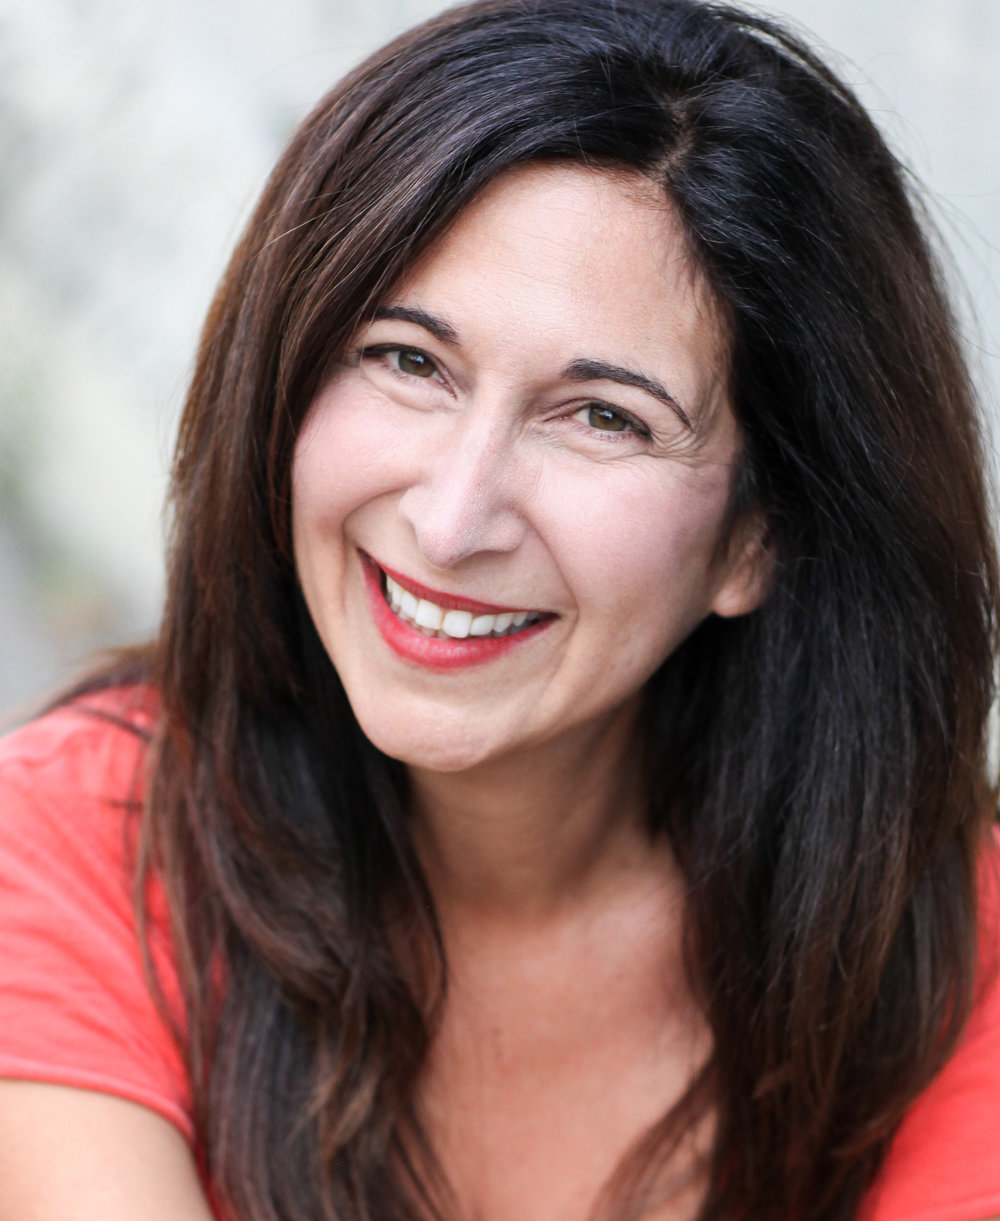 Amy Herzberg , Associate Artistic Director (479) 445-6333  amy@theatre2.org